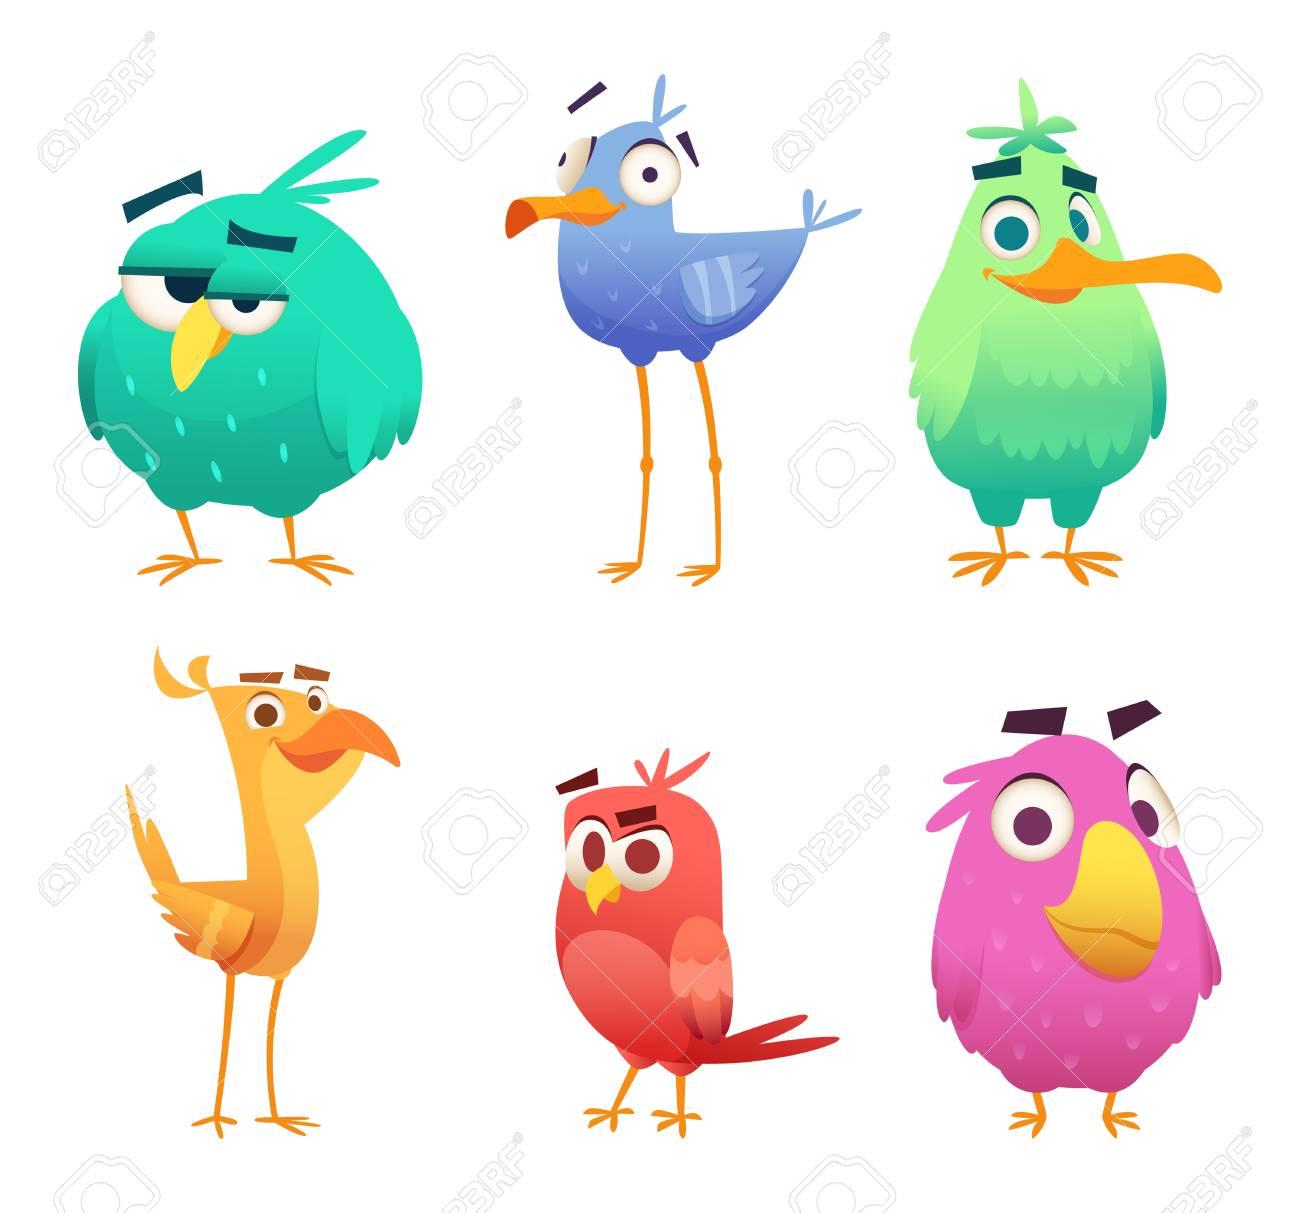 Cartoon funny birds. Faces of cute animals colored baby eagles...